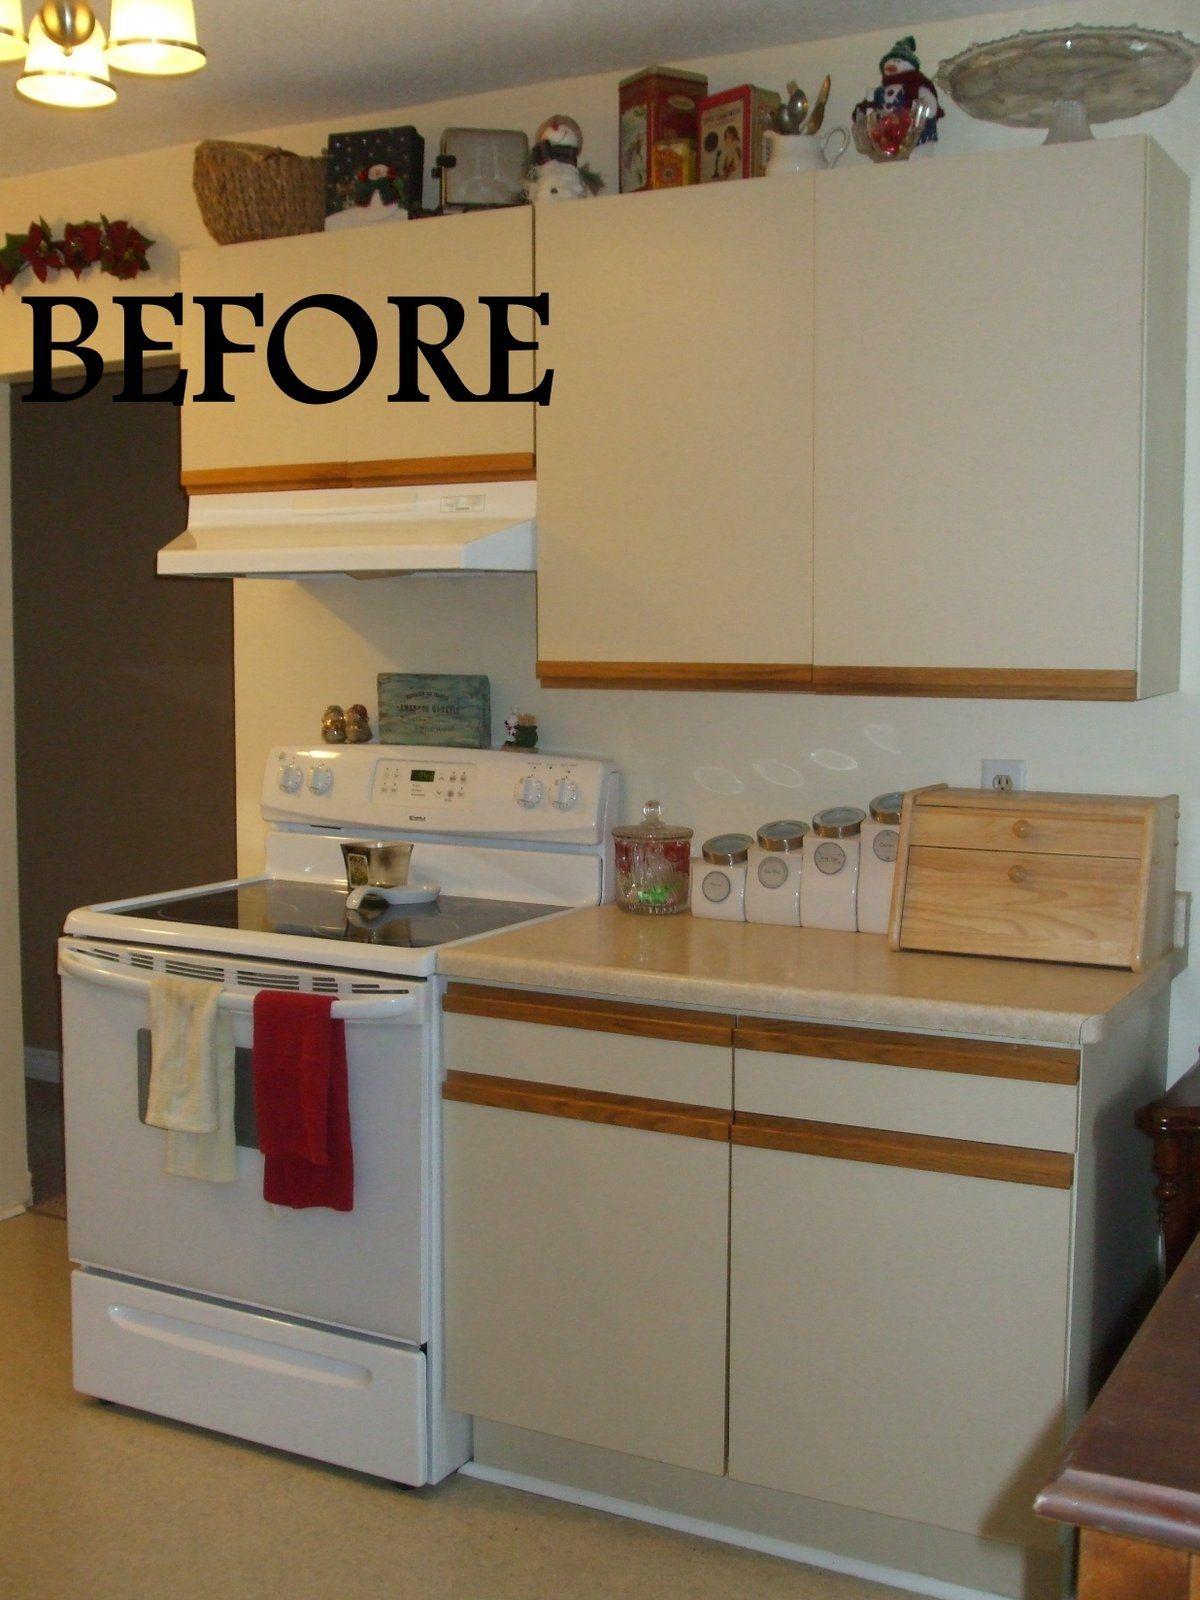 Updating 1980S Kitchen Cabinets | Kitchen Cabinets | Pinterest